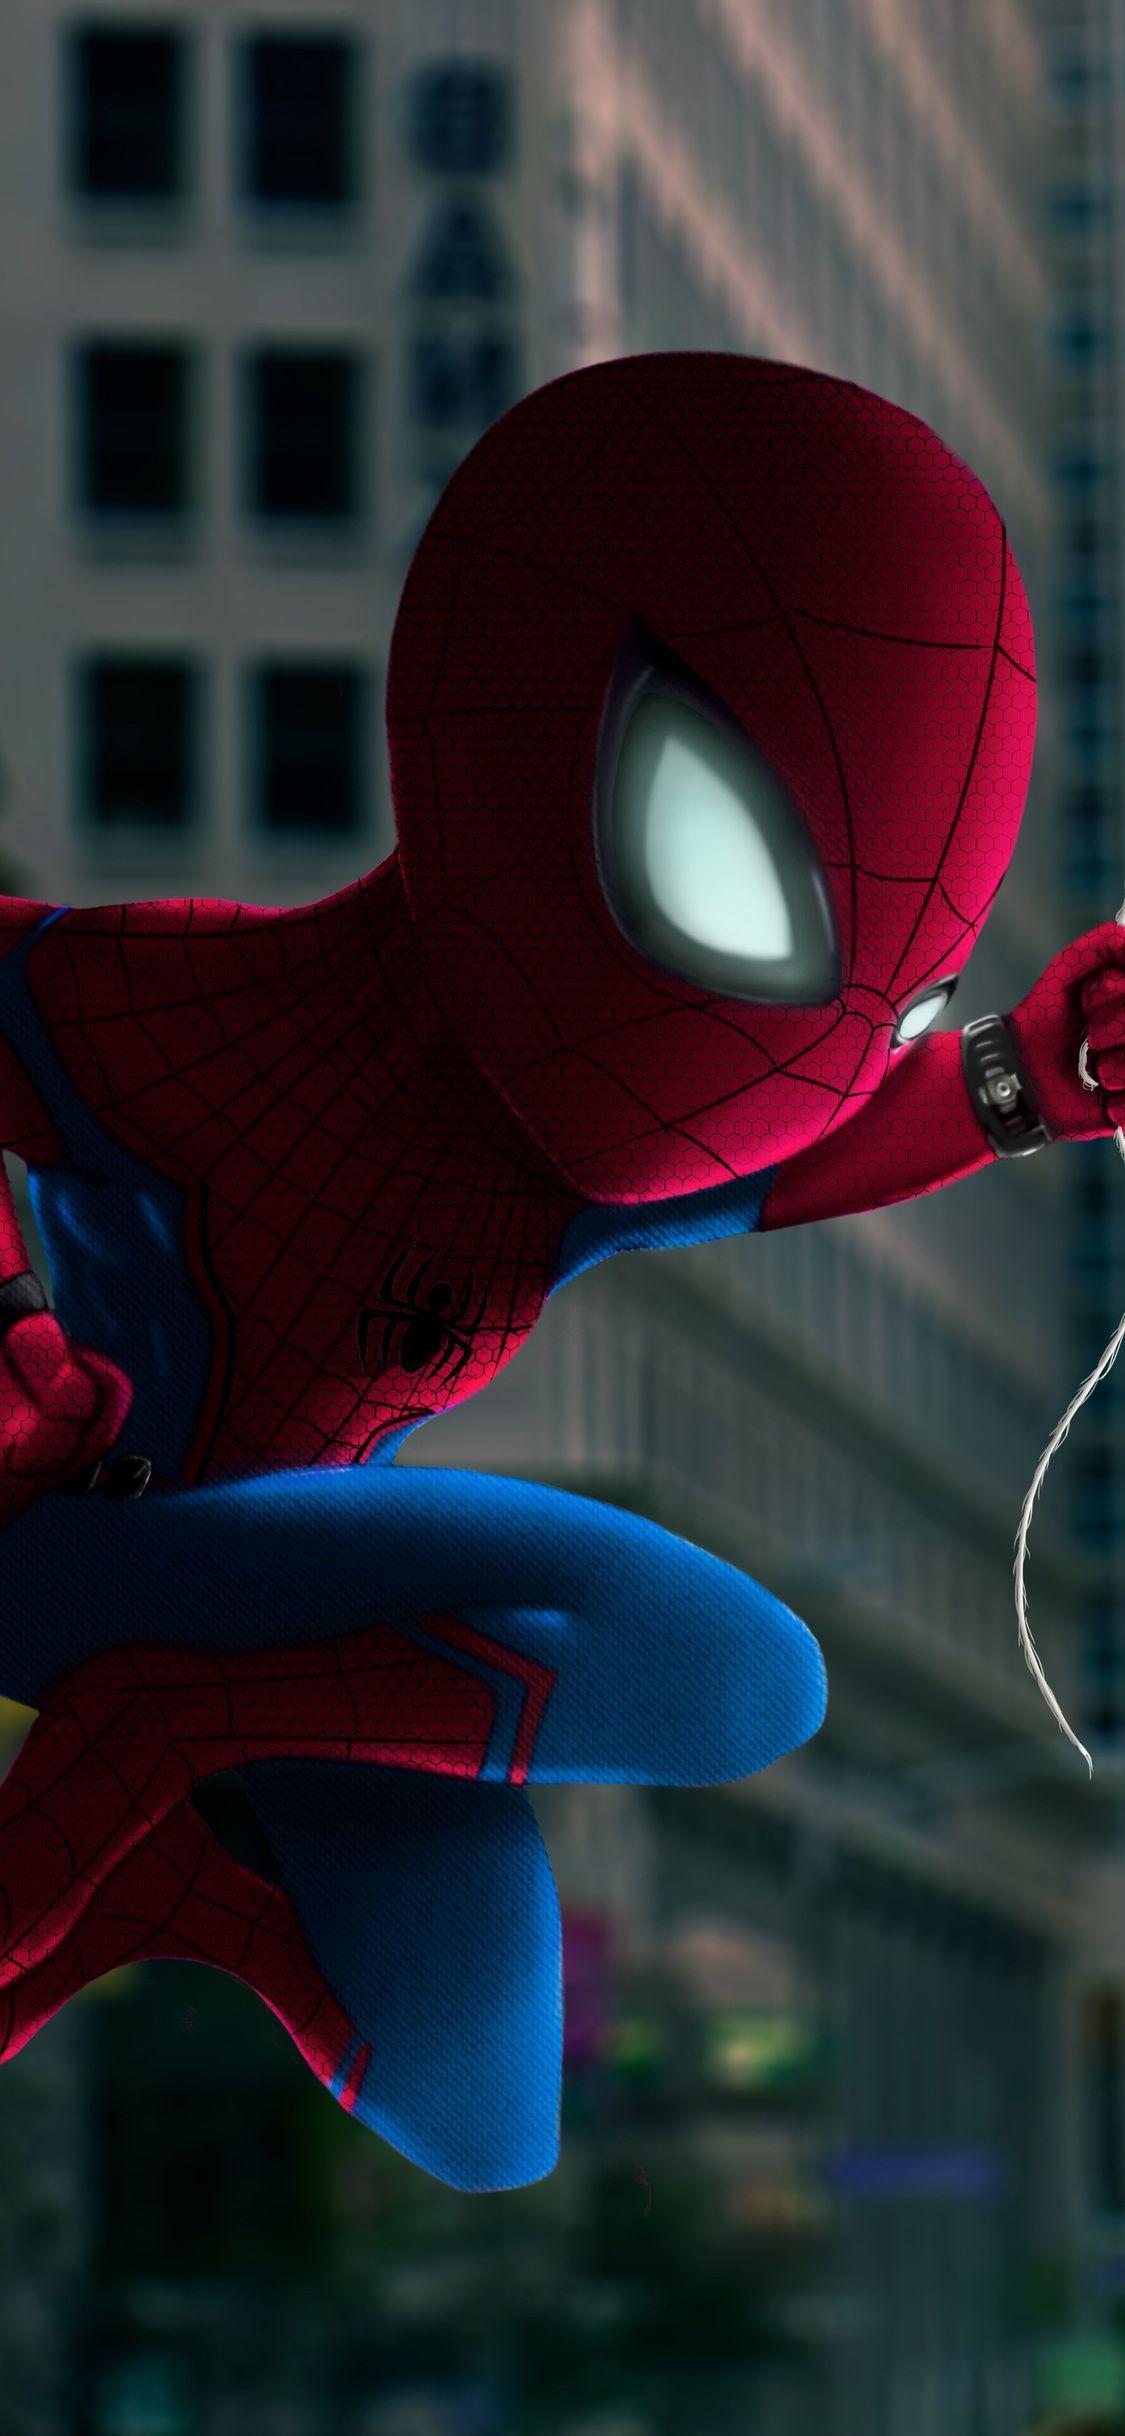 Spiderman iPhone X Wallpapers - Top